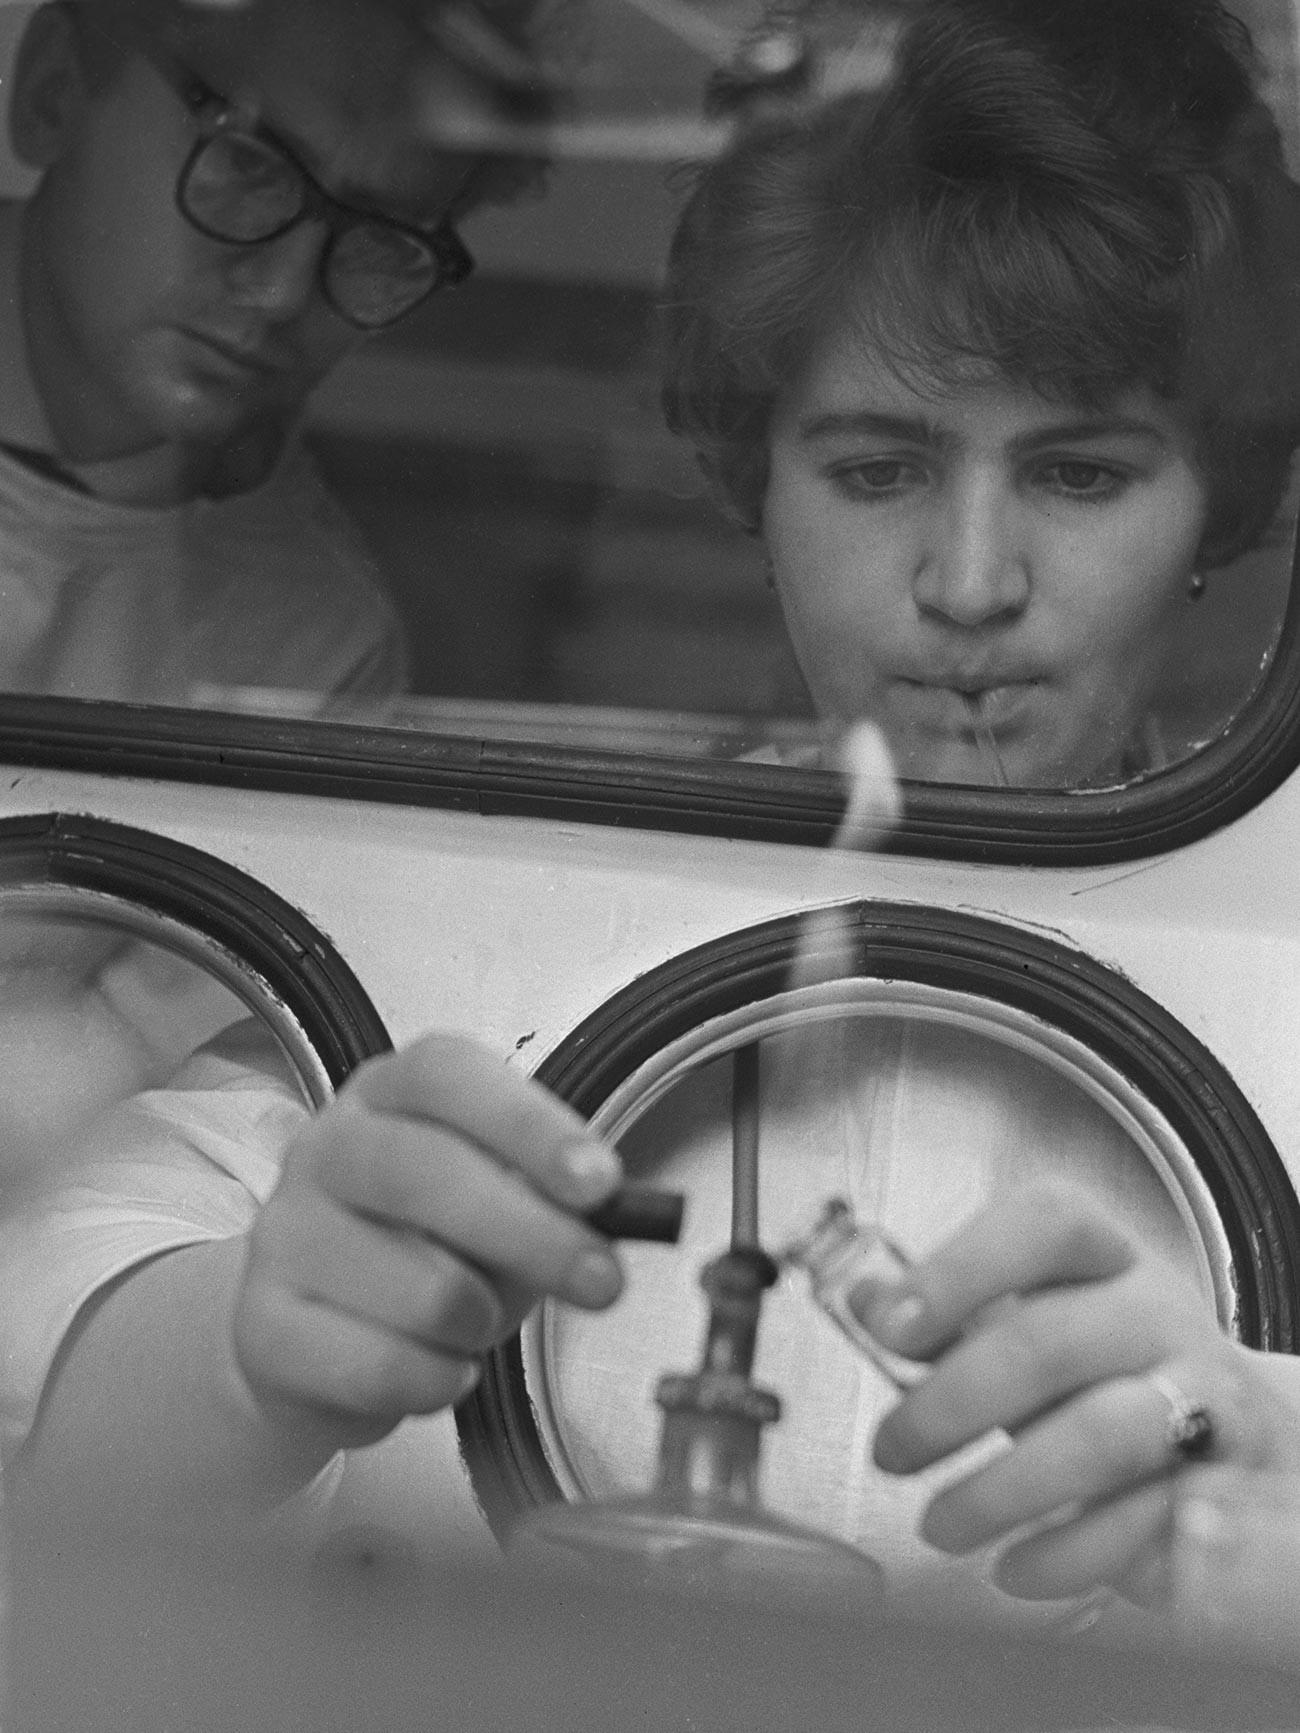 Ilmuwan Institut Poliomyelitis dan Viral Encephalitis dari Akademi Ilmu Kedokteran Soviet (kini dikenal sebagai Institut Mikhail Chumakov) sedang membuat vaksin polio.